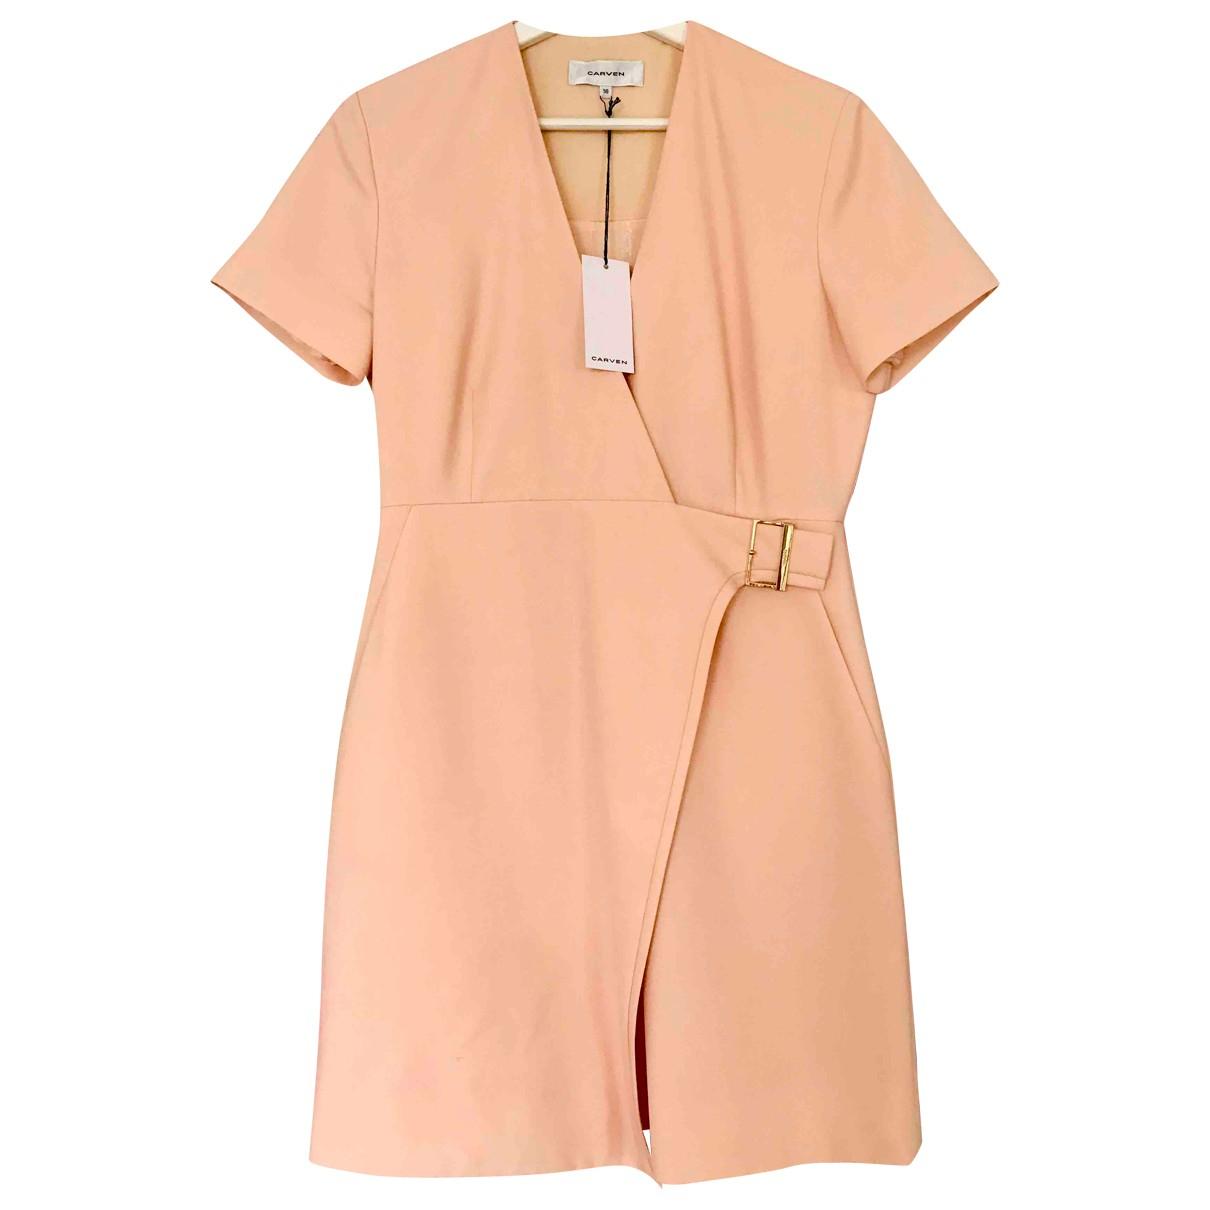 Carven \N Kleid in  Rosa Polyester